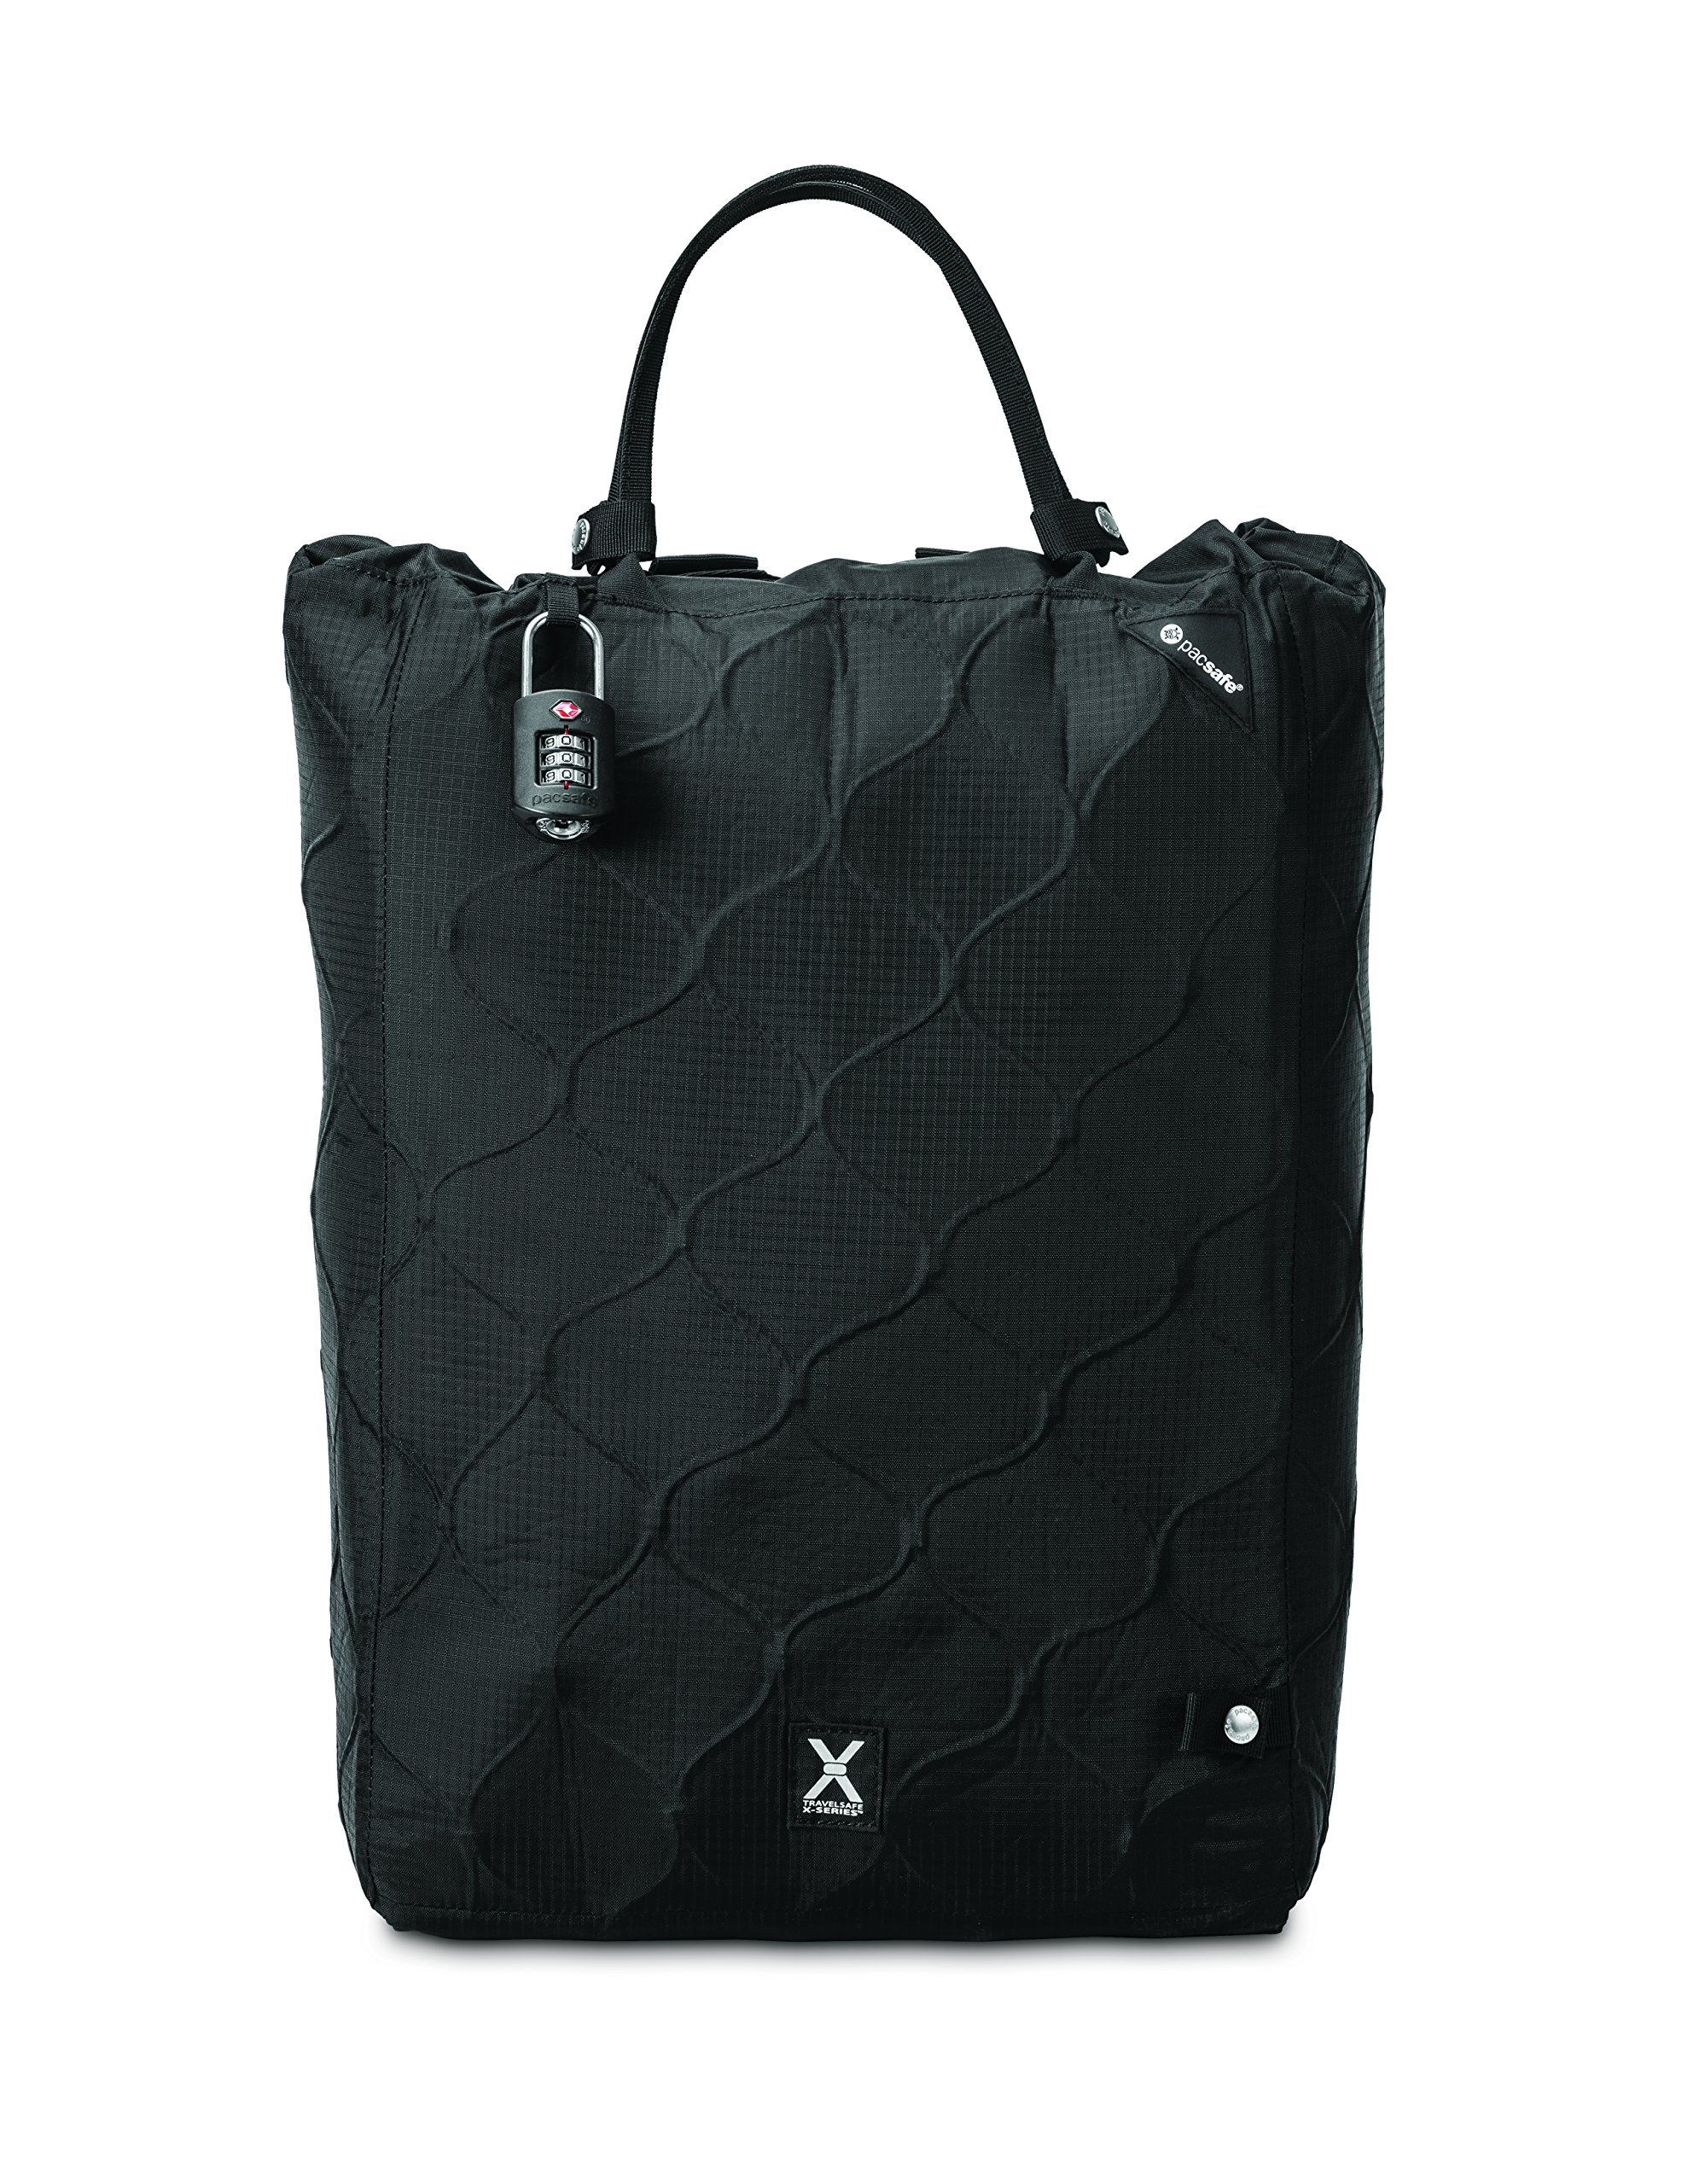 Pacsafe Travelsafe X25 Anti-Theft Portable Safe, Black by Pacsafe (Image #2)